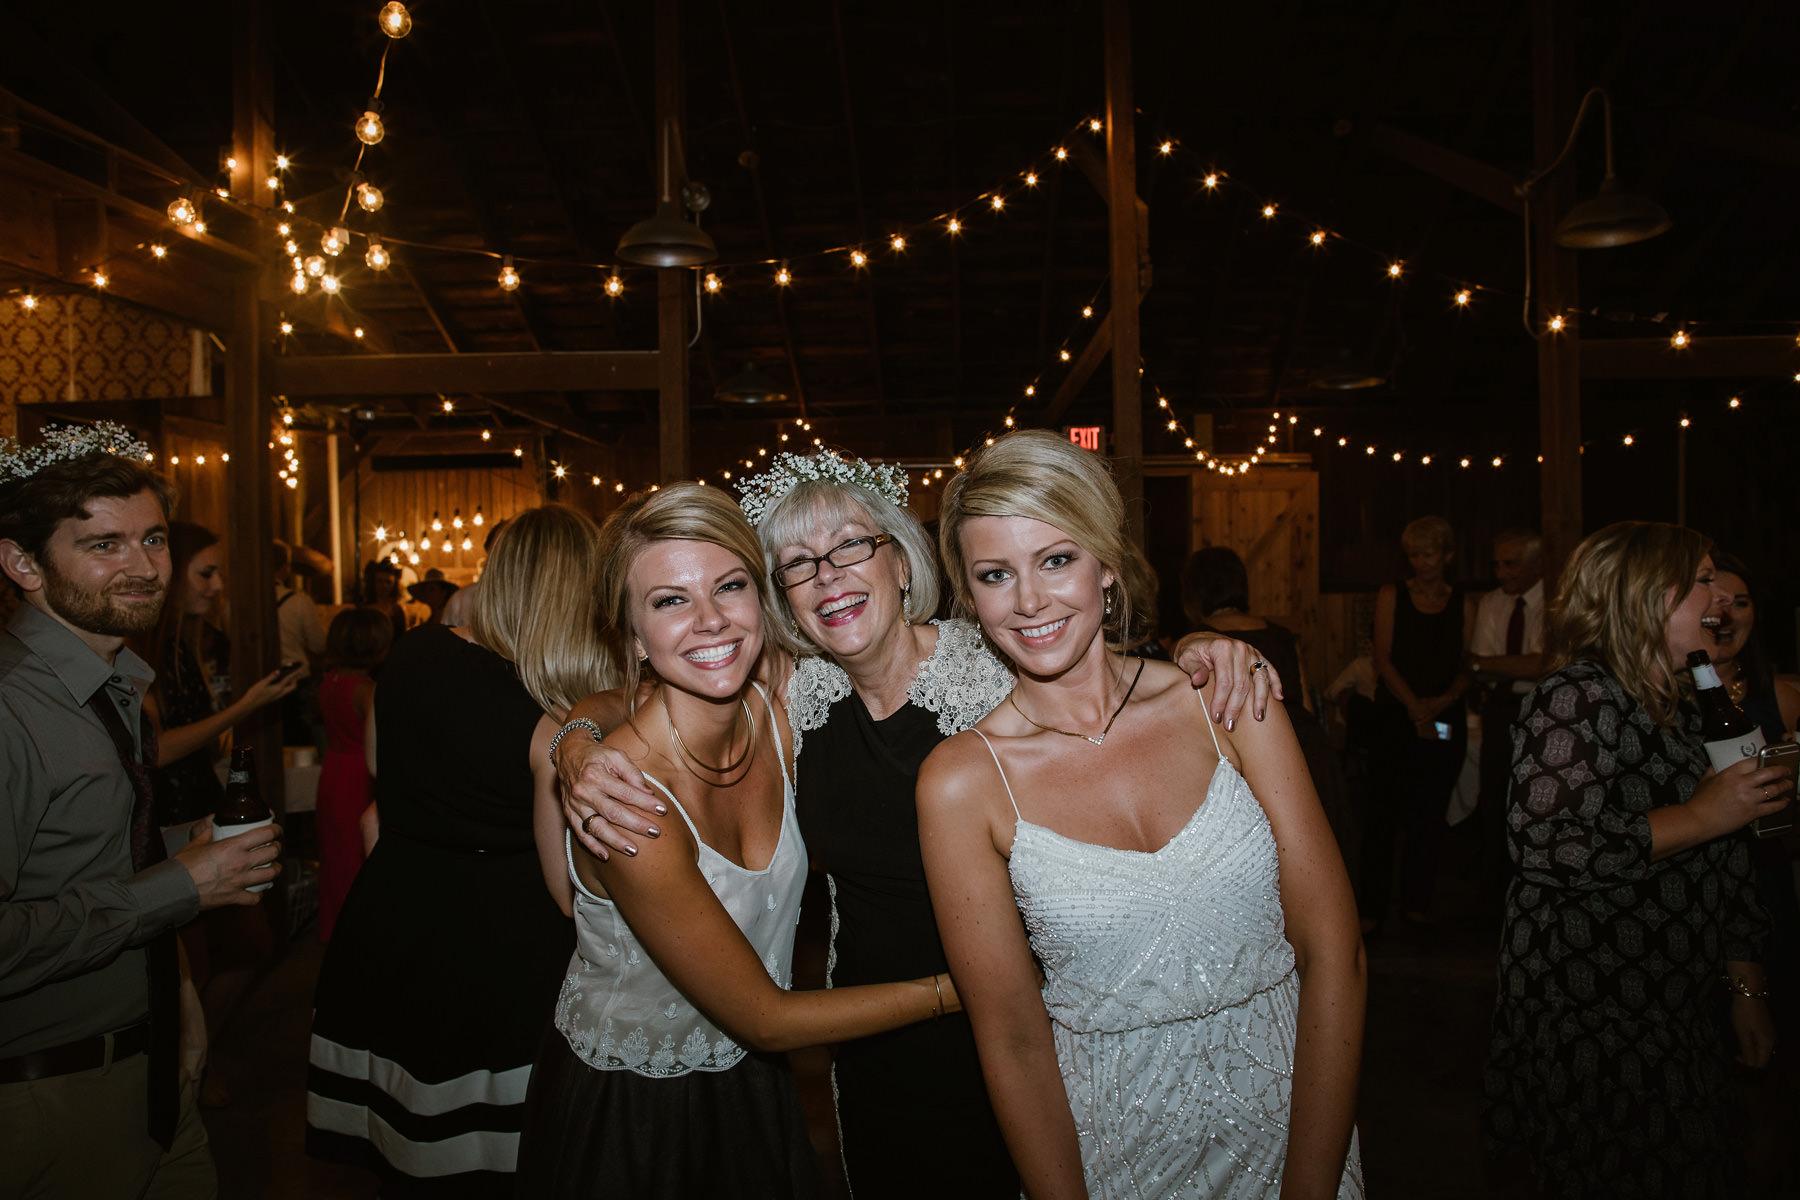 Alldredge Orchard Kansas City_Kindling Wedding Photography BLOG 83.JPG